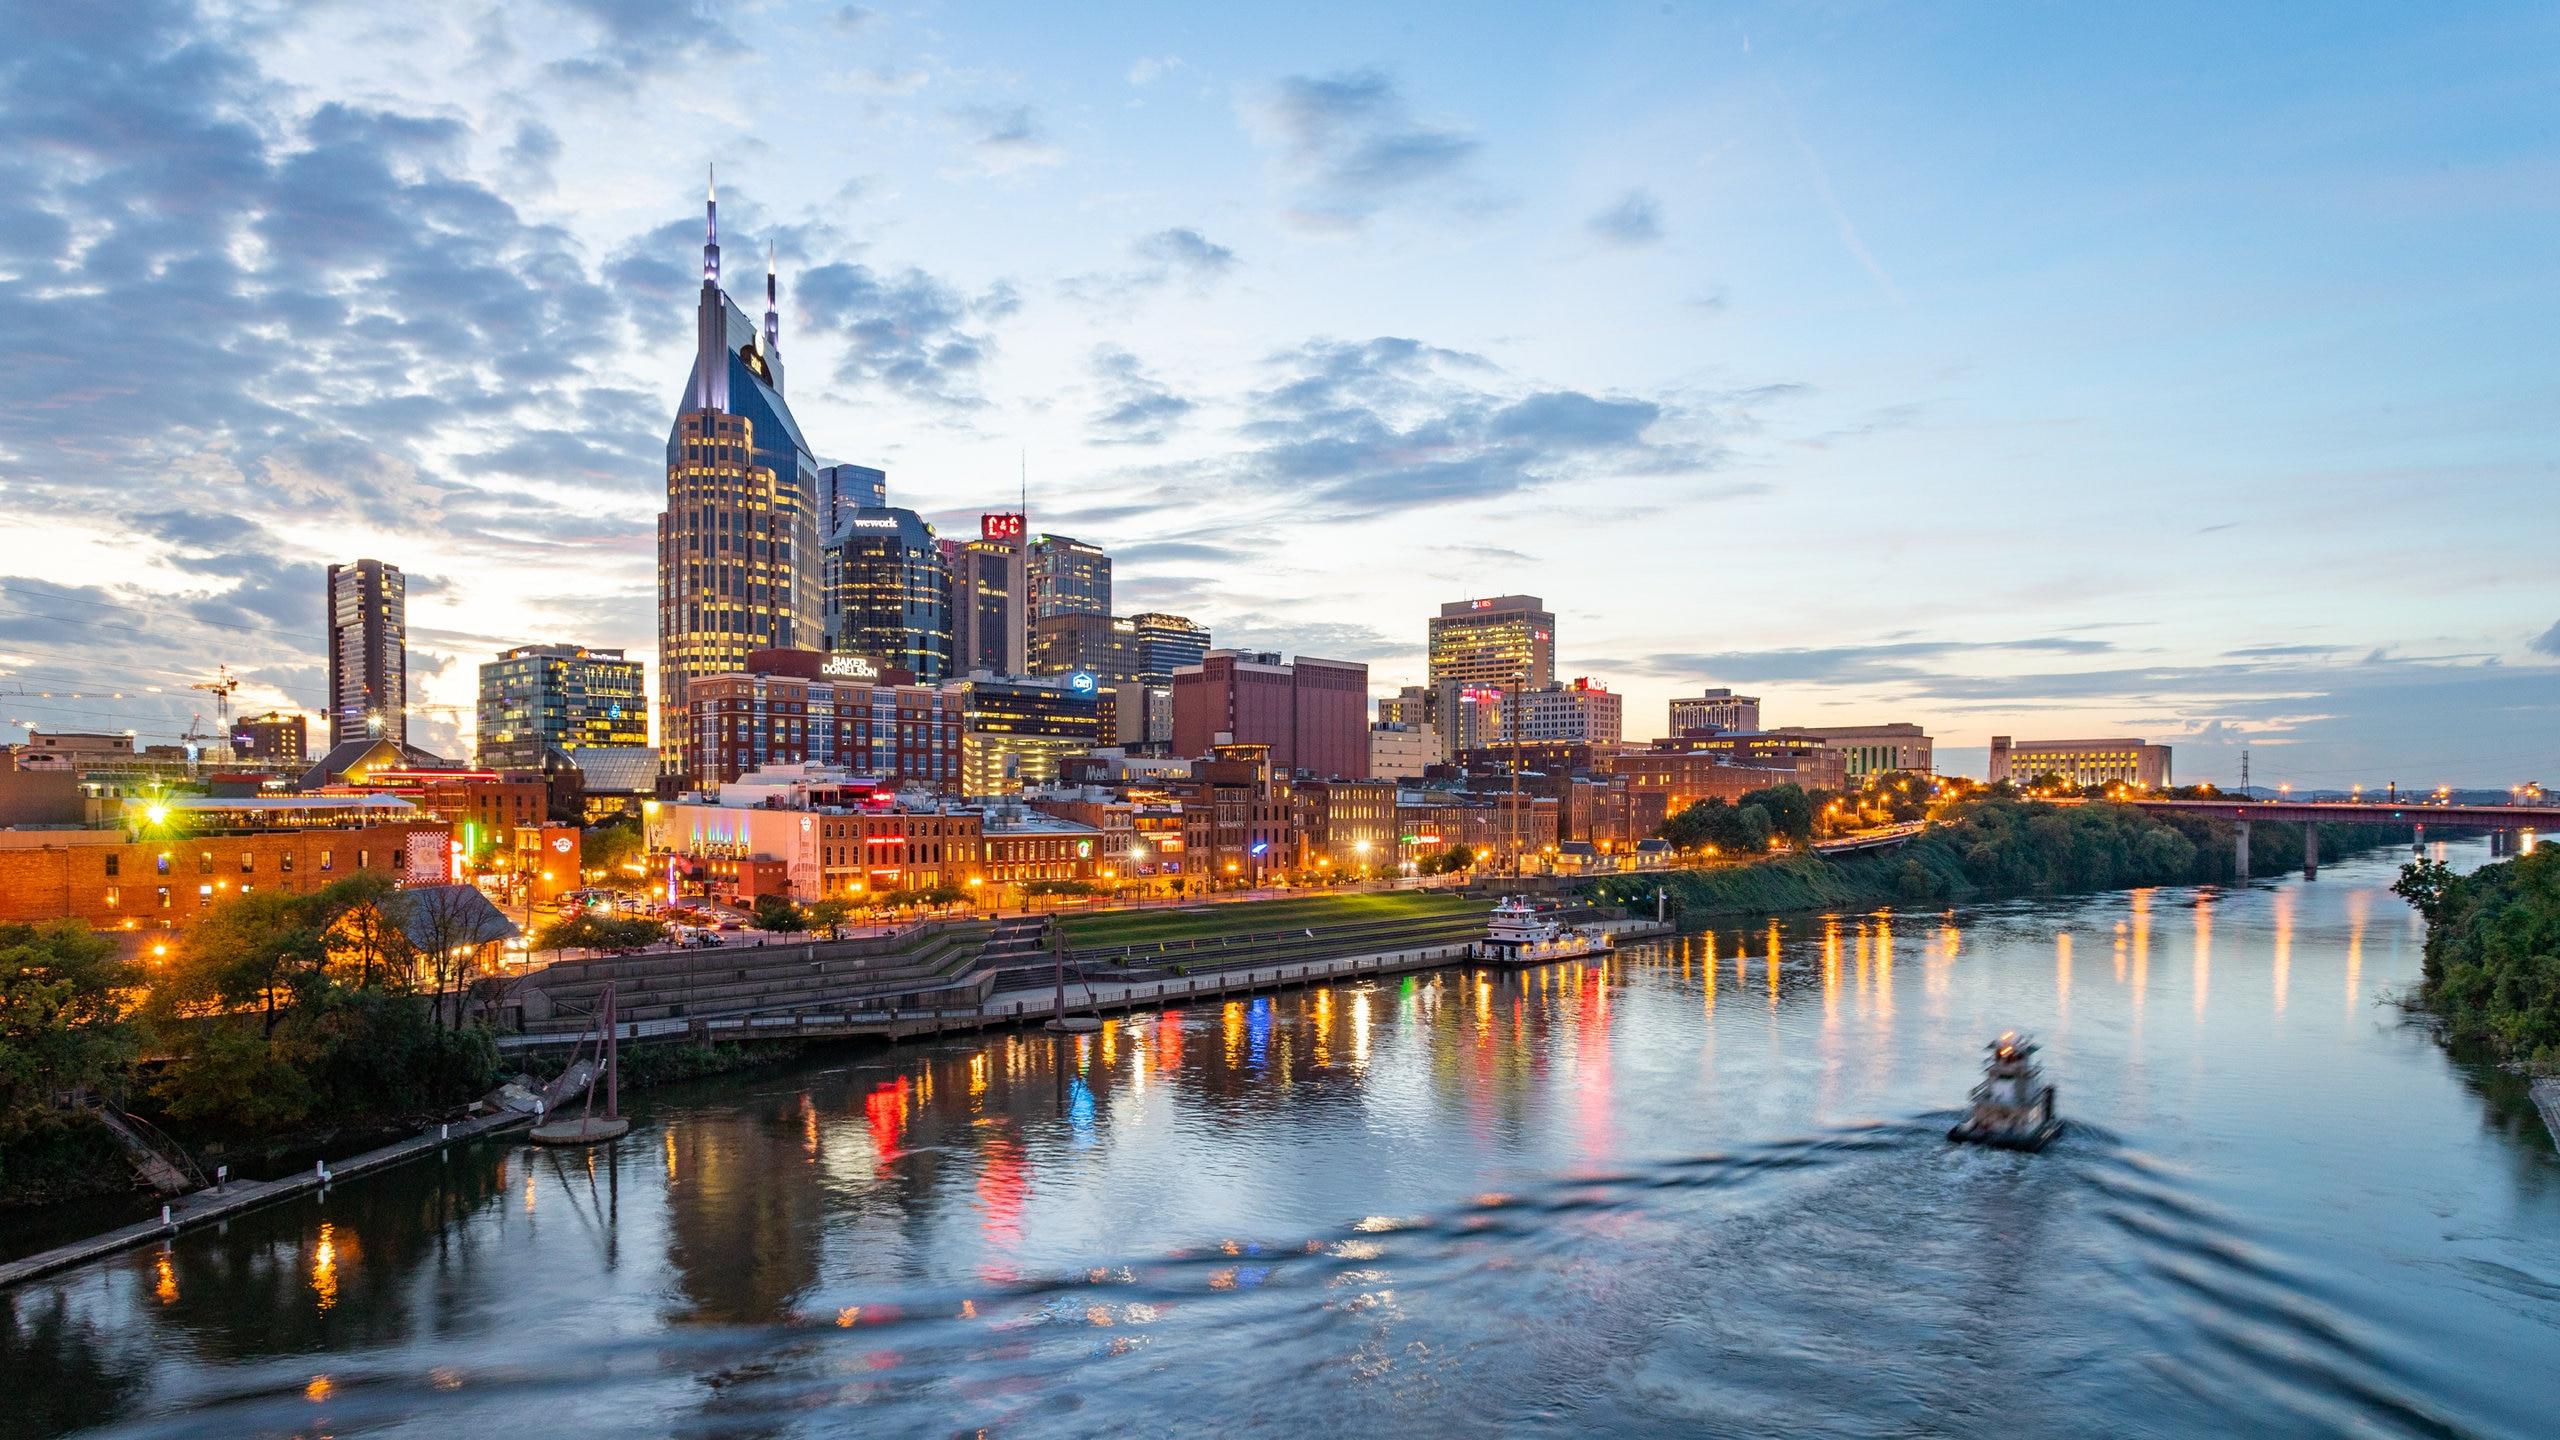 Downtown Nashville, Nashville, Tennessee, United States of America